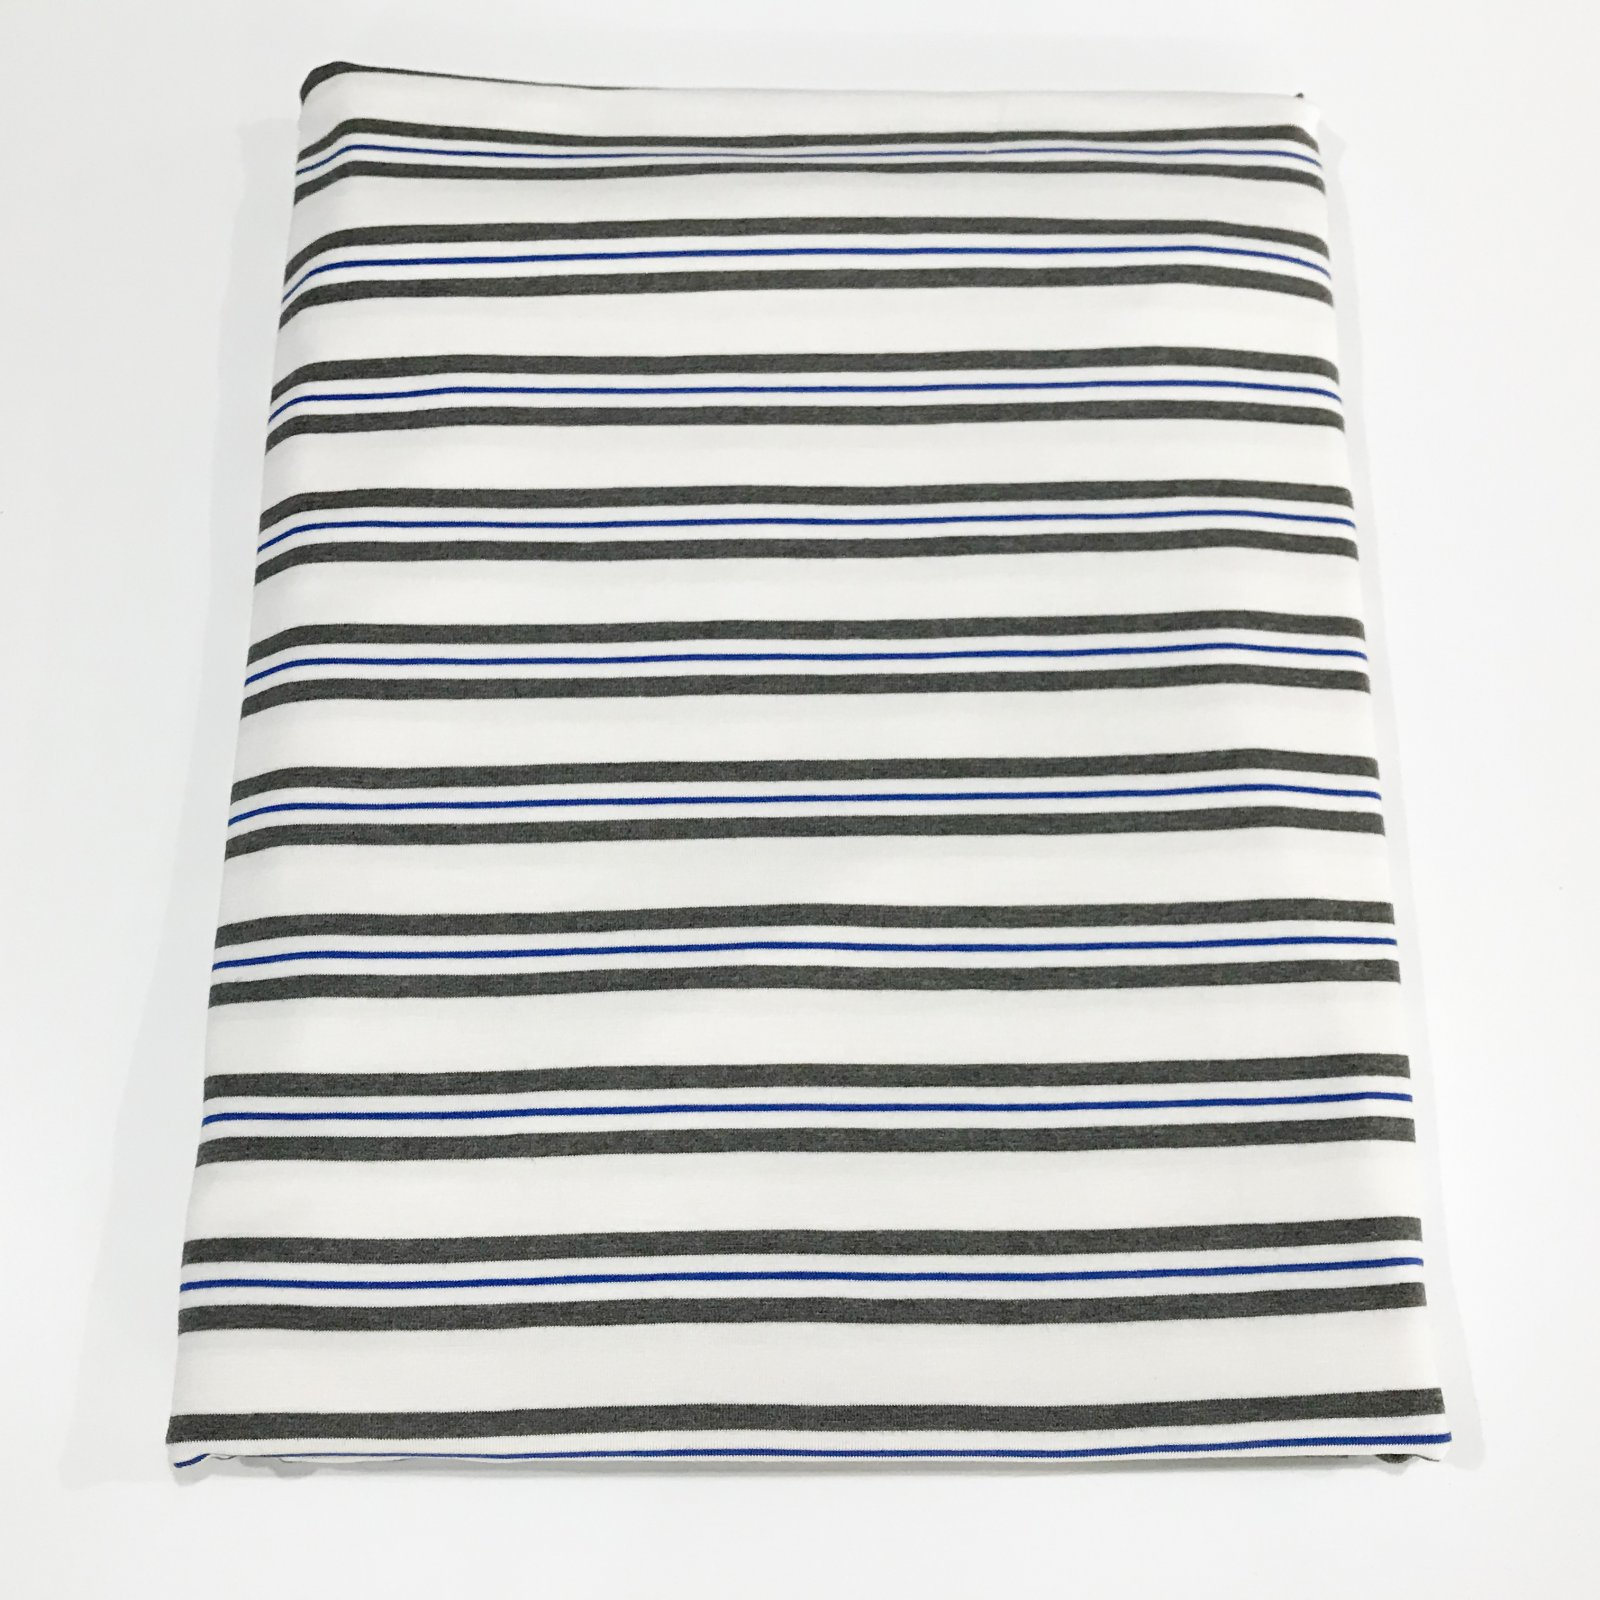 1 1/2 yards - Bamboo Stripe - Grey & Royal on White